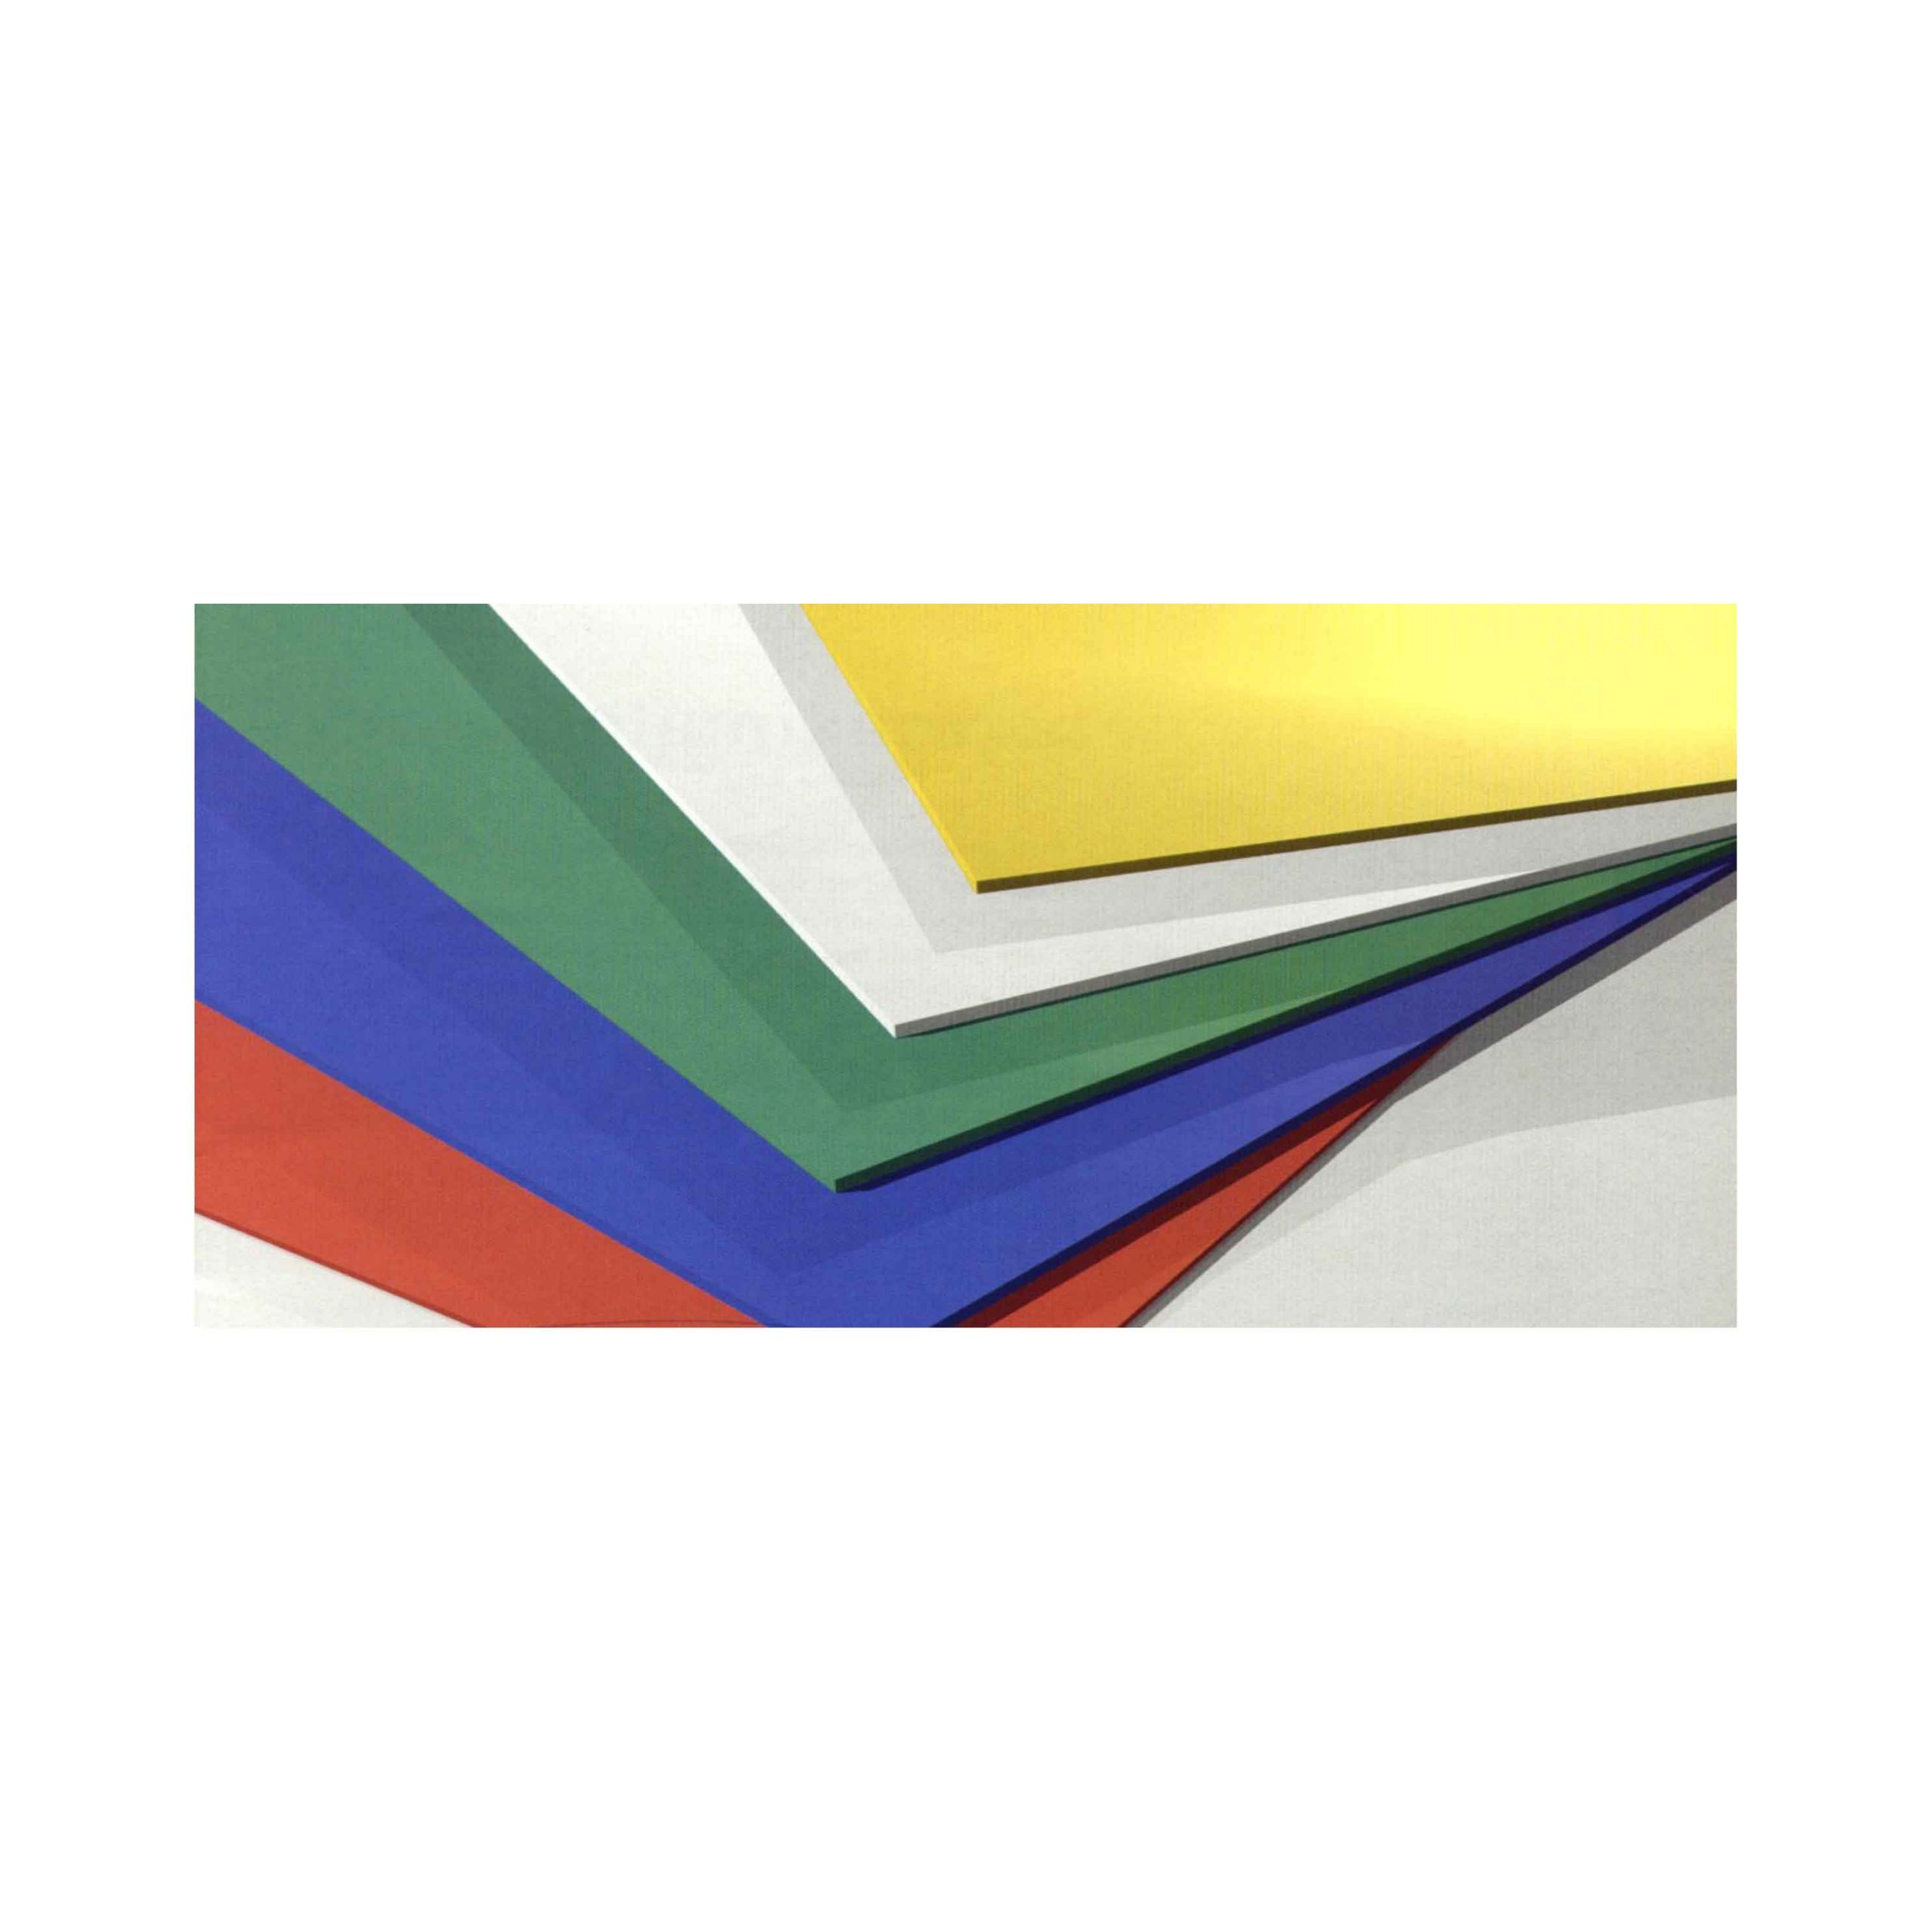 PLAQUE_PVC_BLANC_DECO_REF_6514_SEMI_RIGIDE_BSB_CAOUTCHOUCS_PLASTIQUES